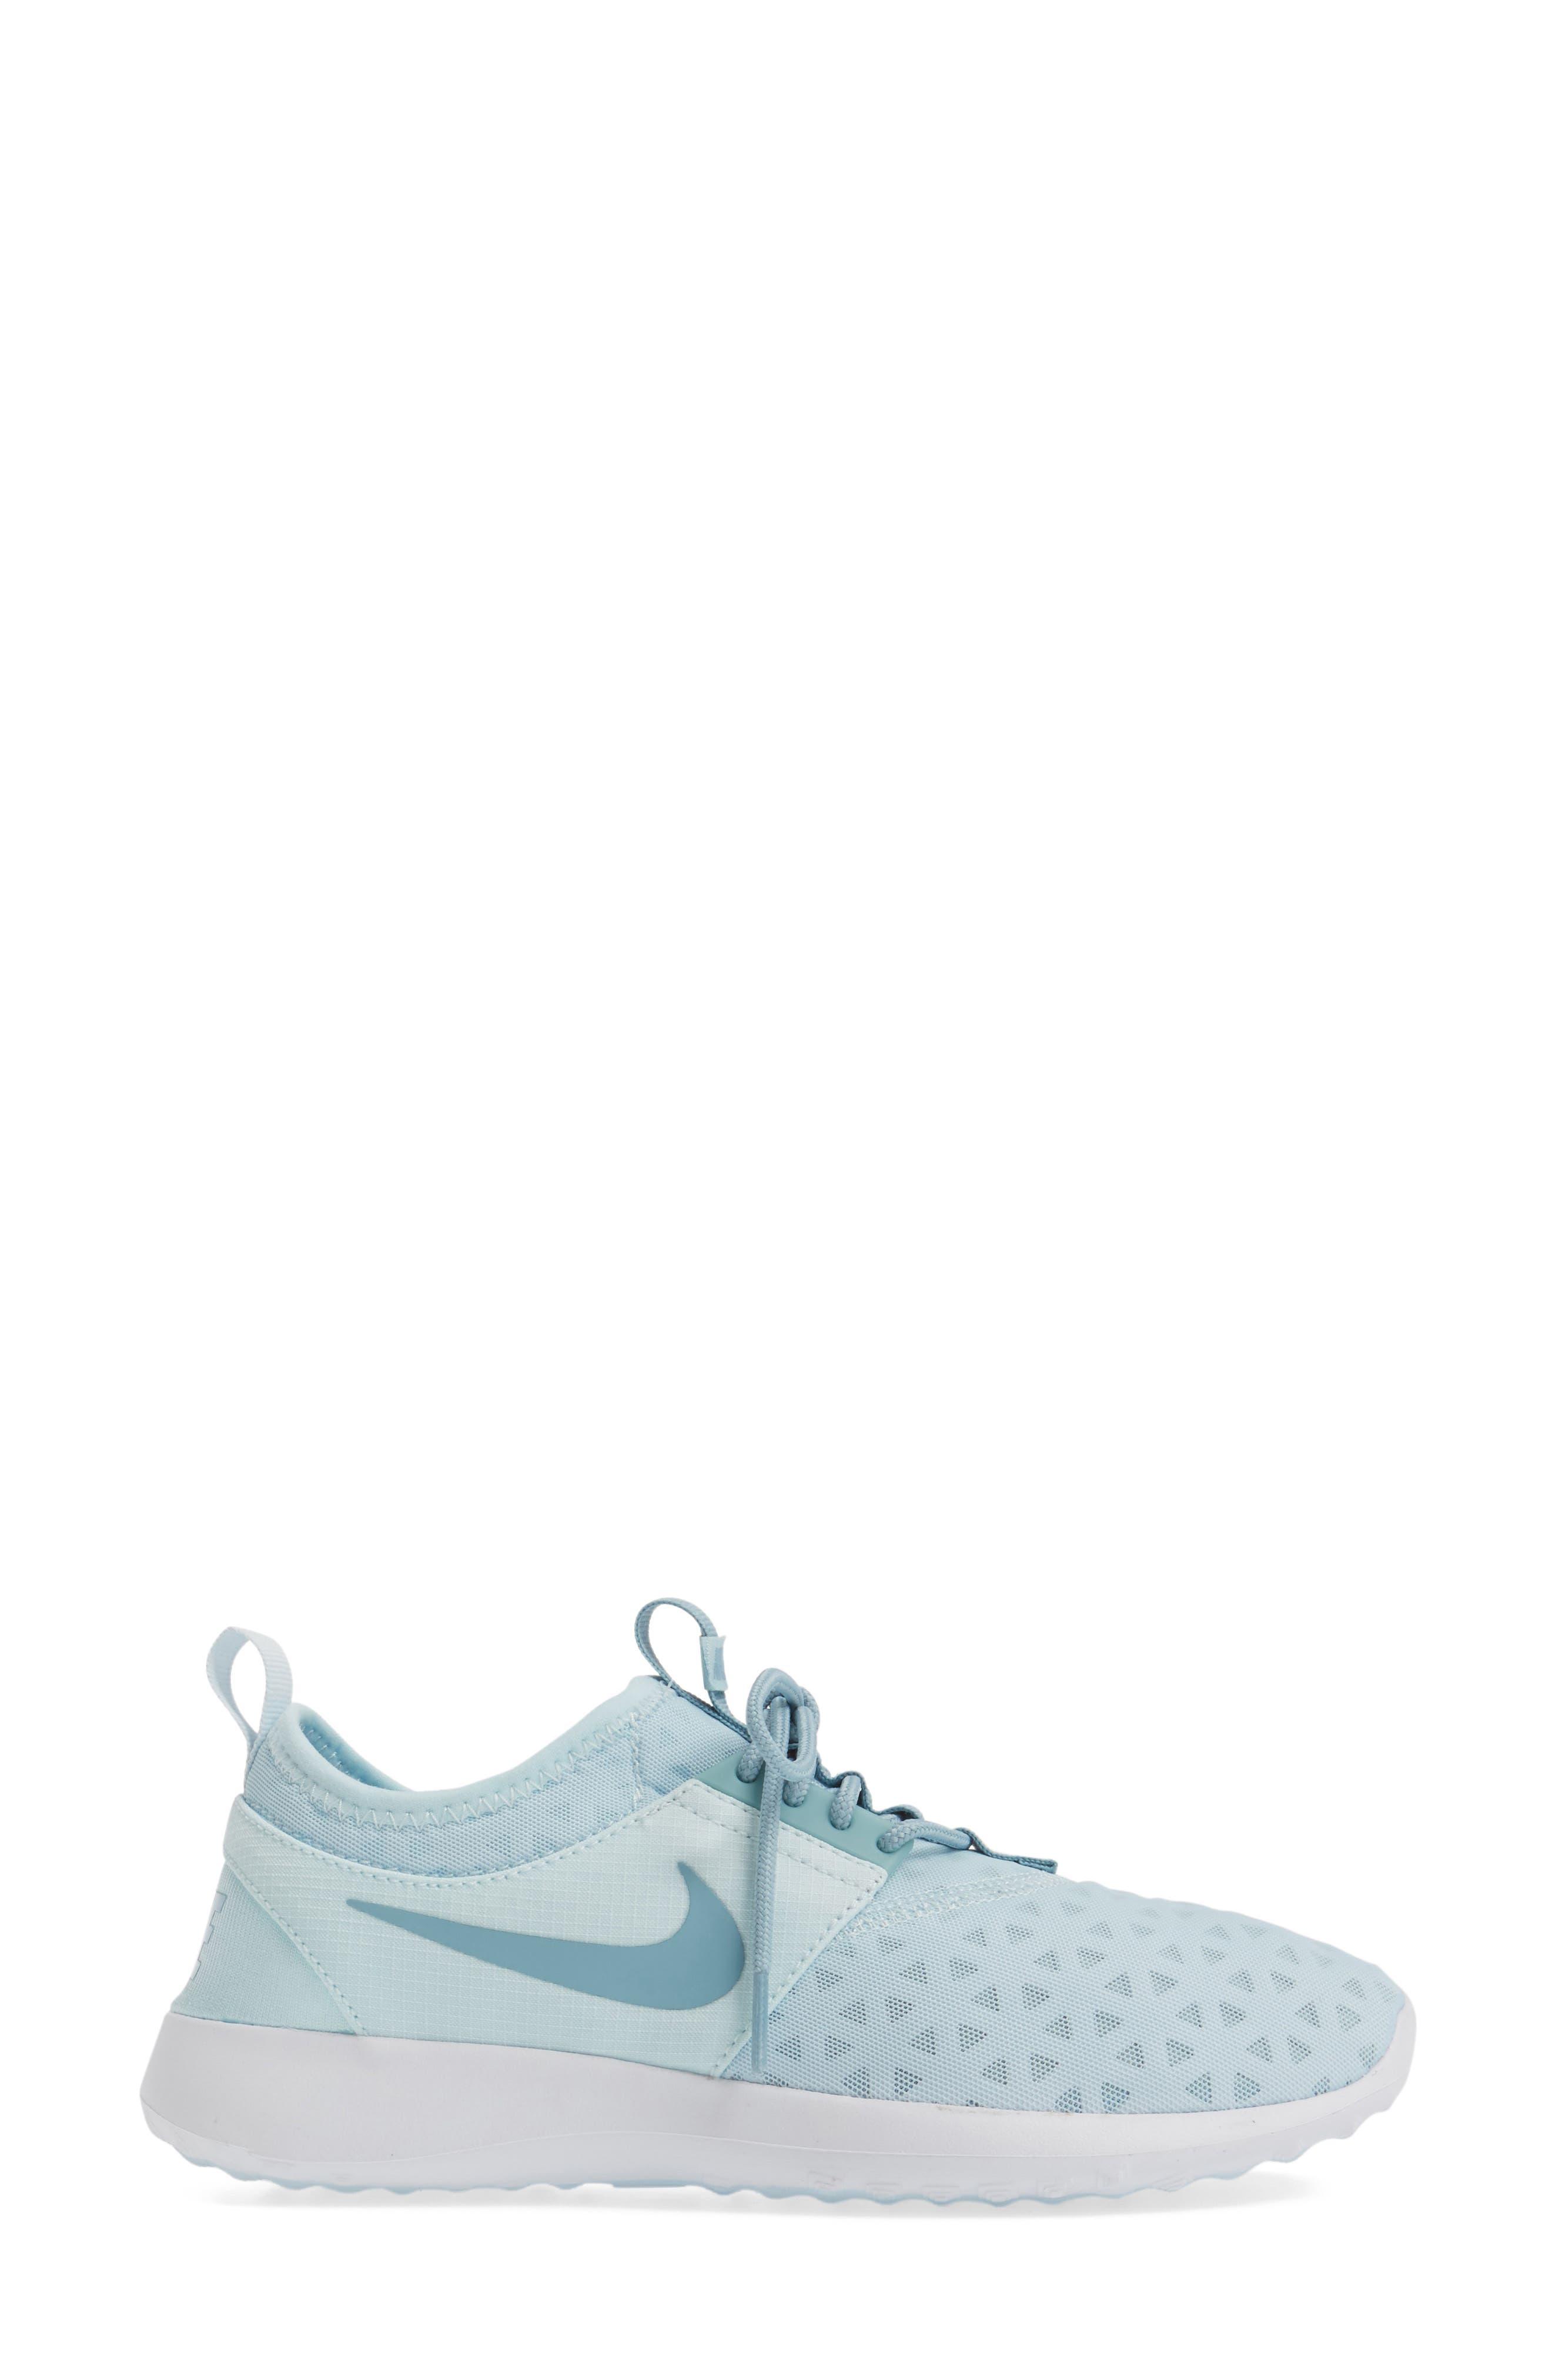 Juvenate Sneaker,                             Alternate thumbnail 153, color,